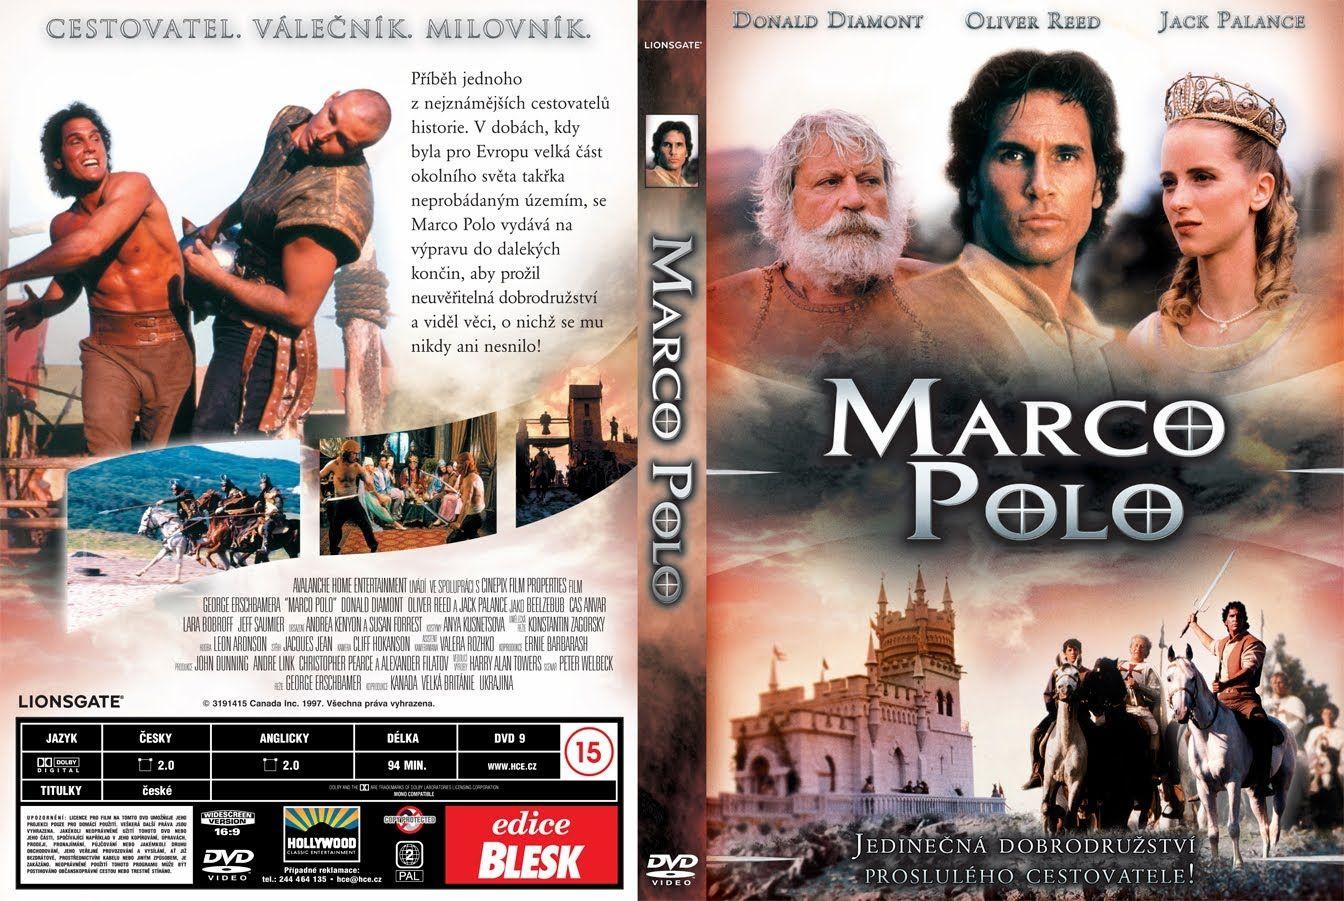 Marco Polo (aventura histórica) - peliculas completas en español de acci...